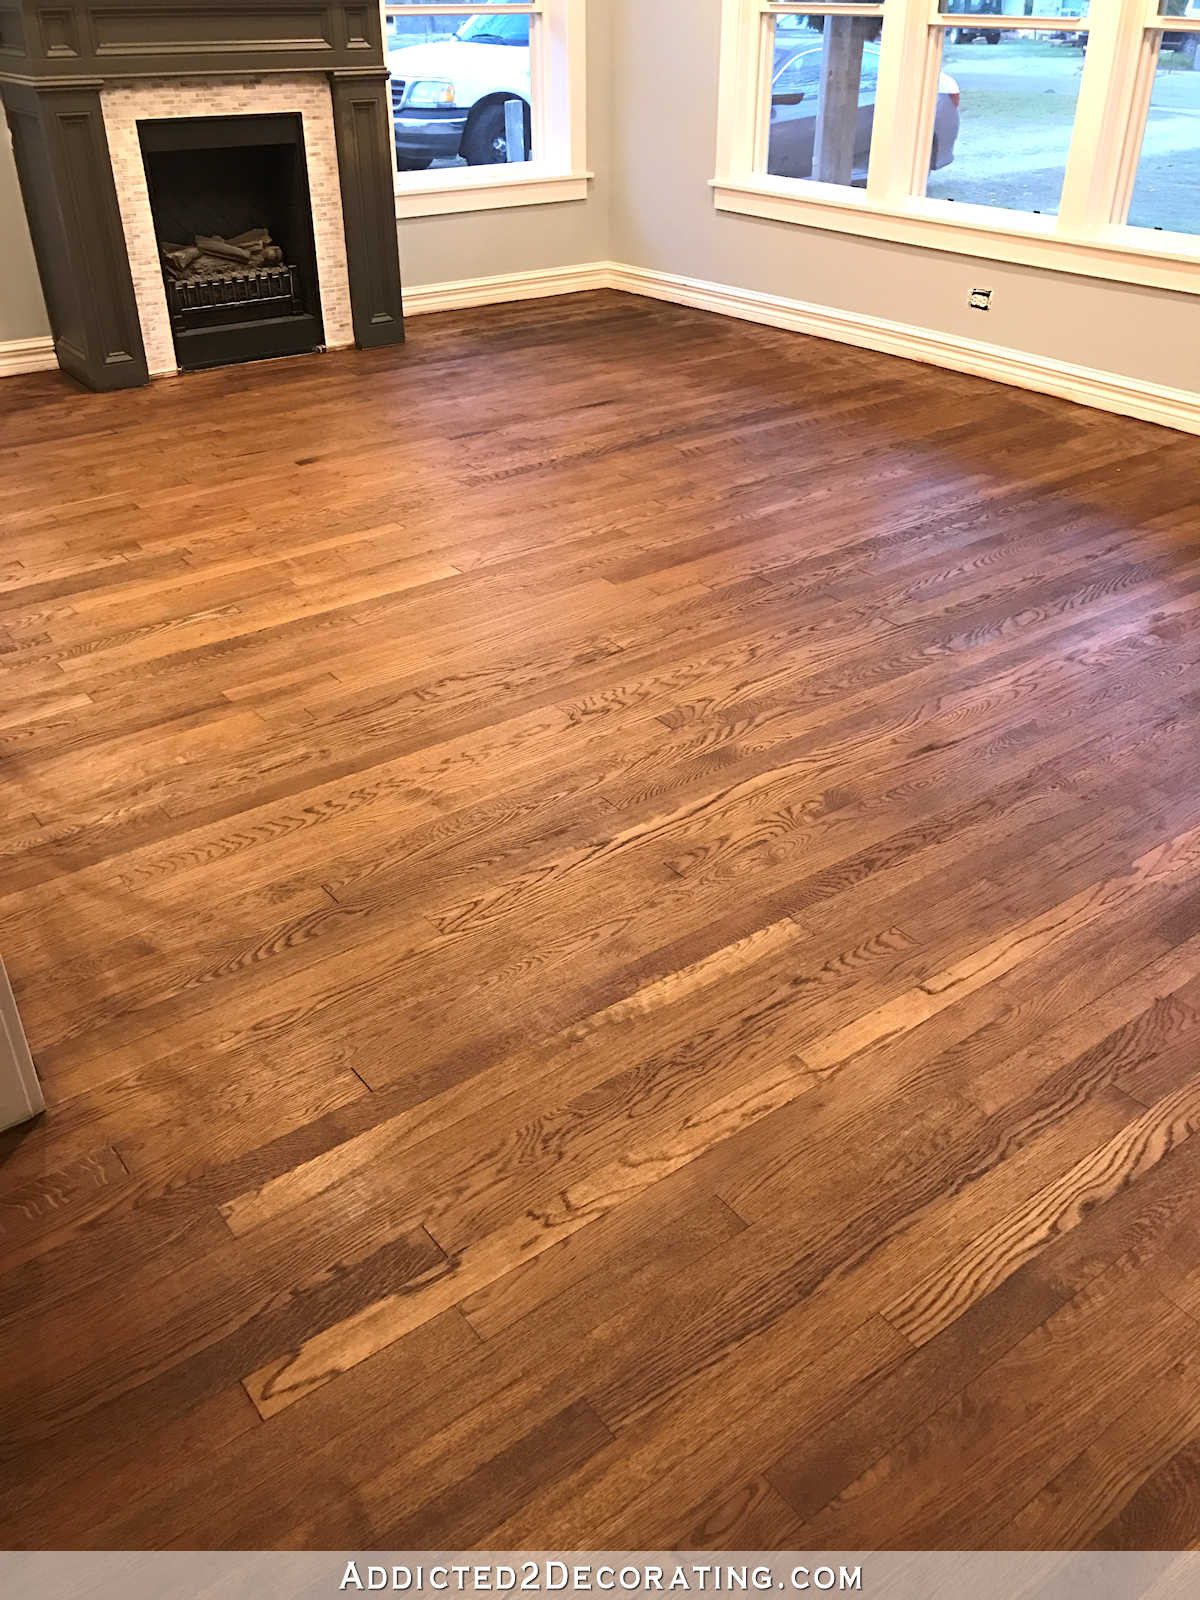 furniture colors for dark hardwood floors of adventures in staining my red oak hardwood floors products process regarding staining red oak hardwood floors 8a living room and entryway